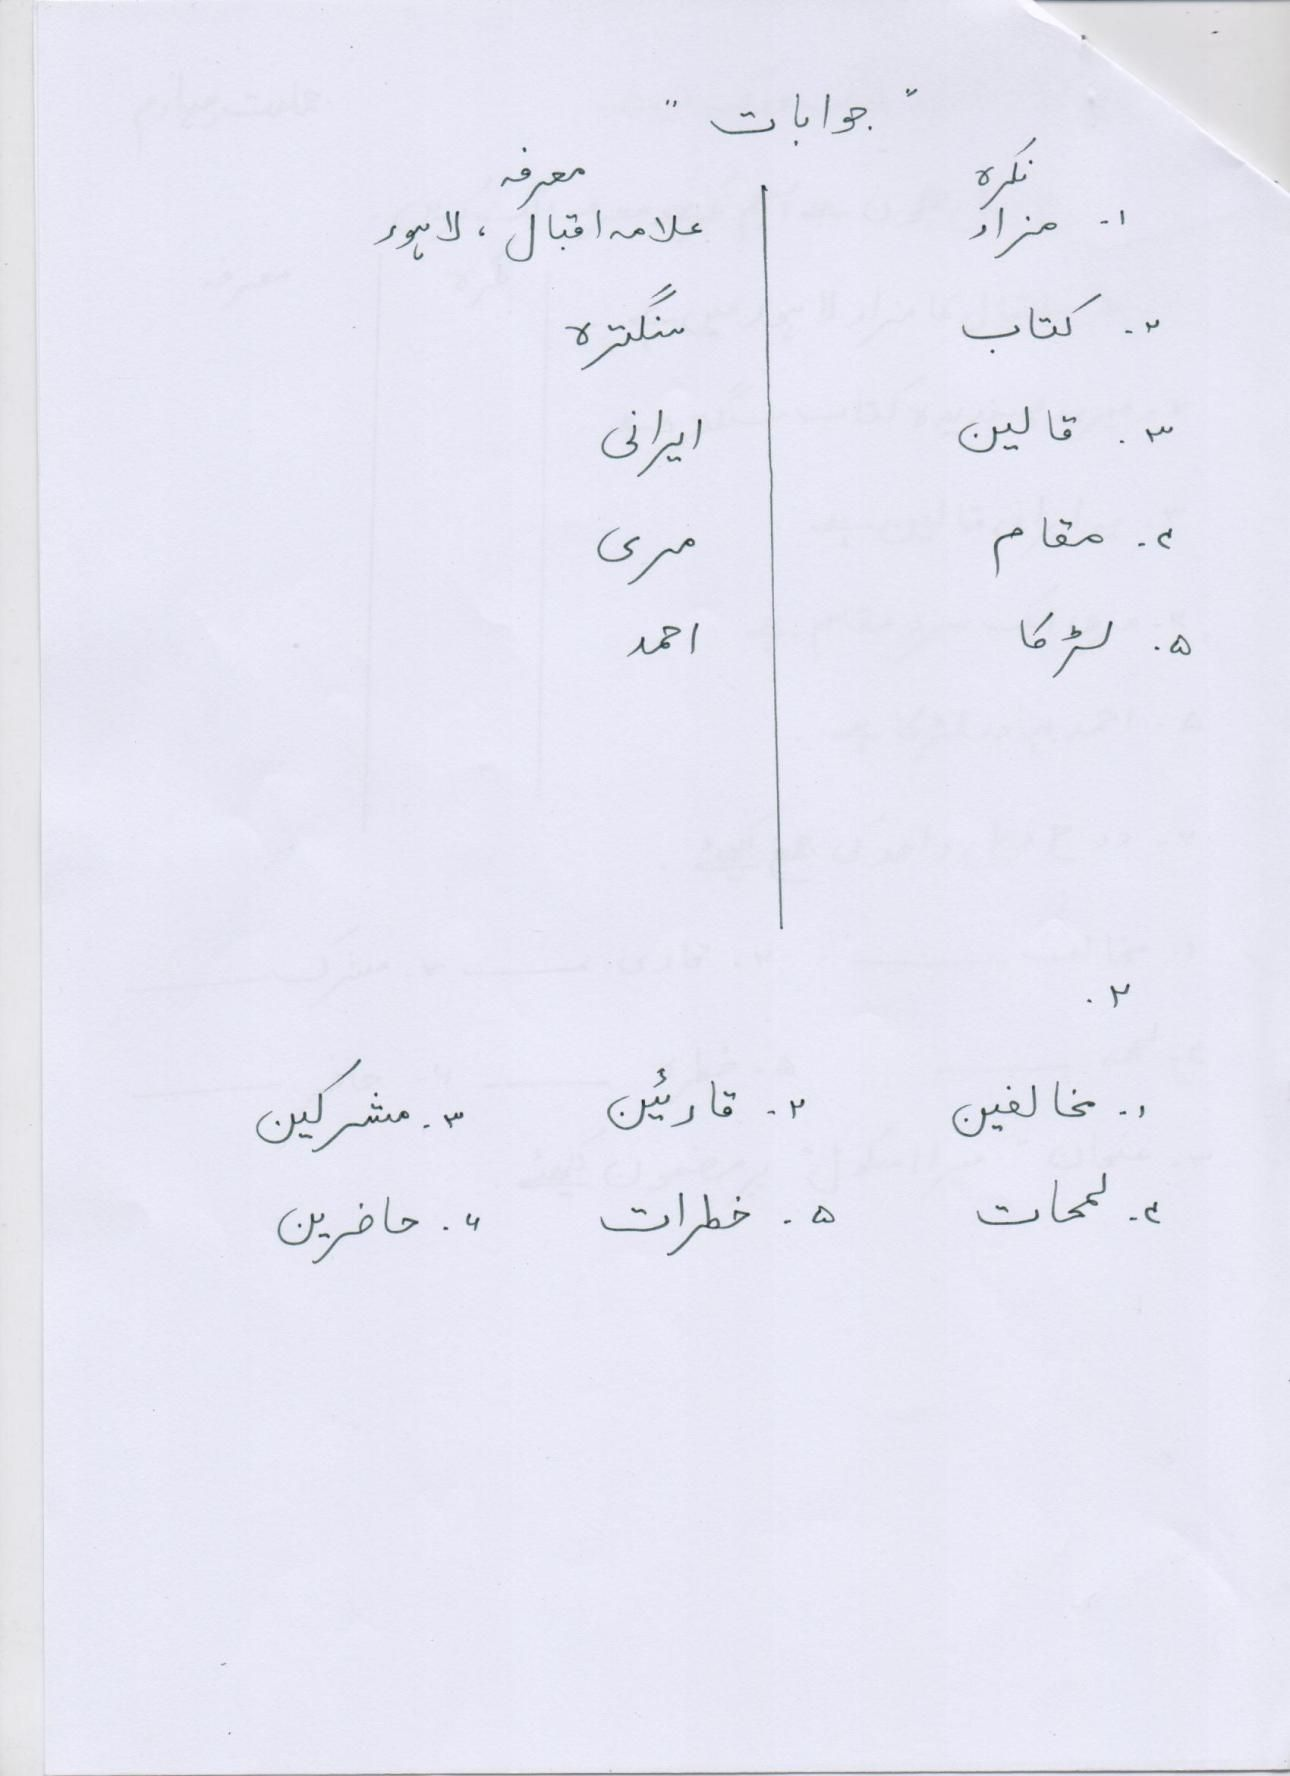 medium resolution of Urdu Worksheet For Class 4 Karachi   Printable Worksheets and Activities  for Teachers